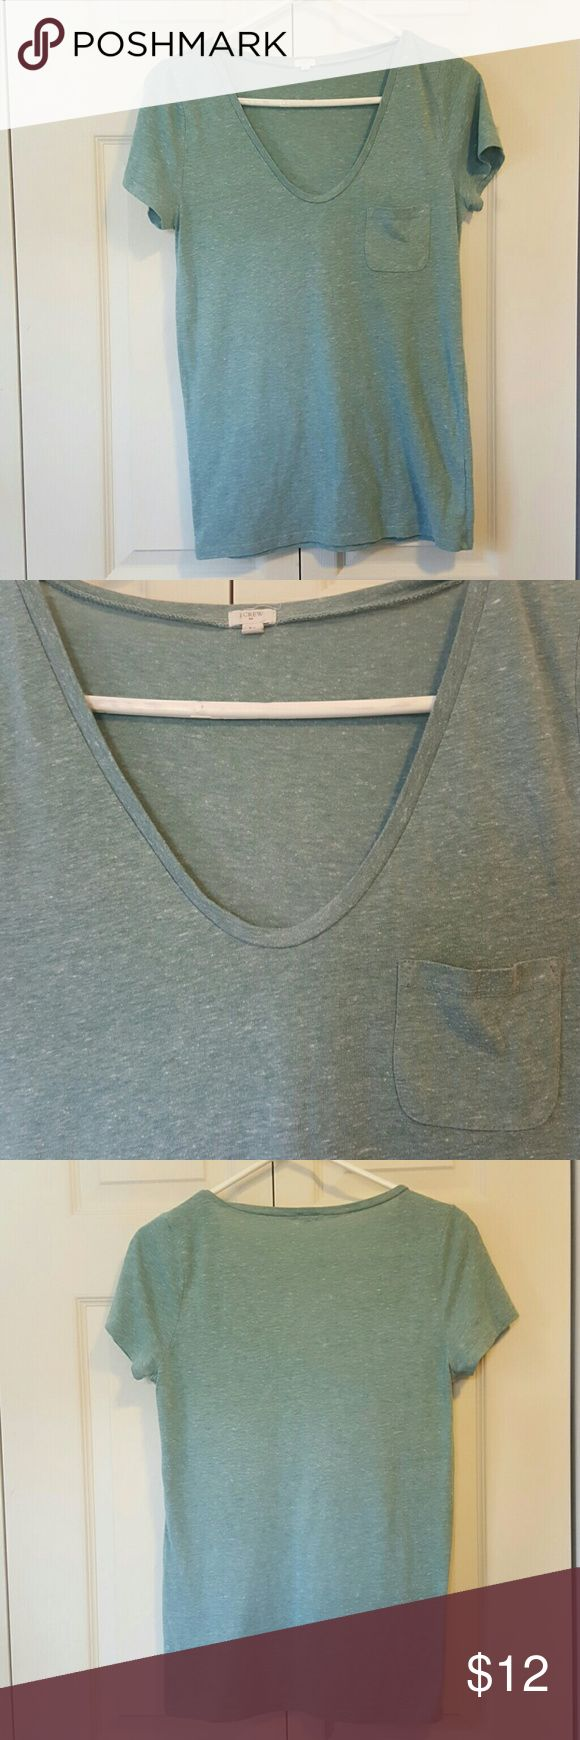 J Crew T Shirt Medium Mint Green J Crew T Shirt Medium Mint Green Bundle 2 and save 20%!! J. Crew Tops Tees - Short Sleeve